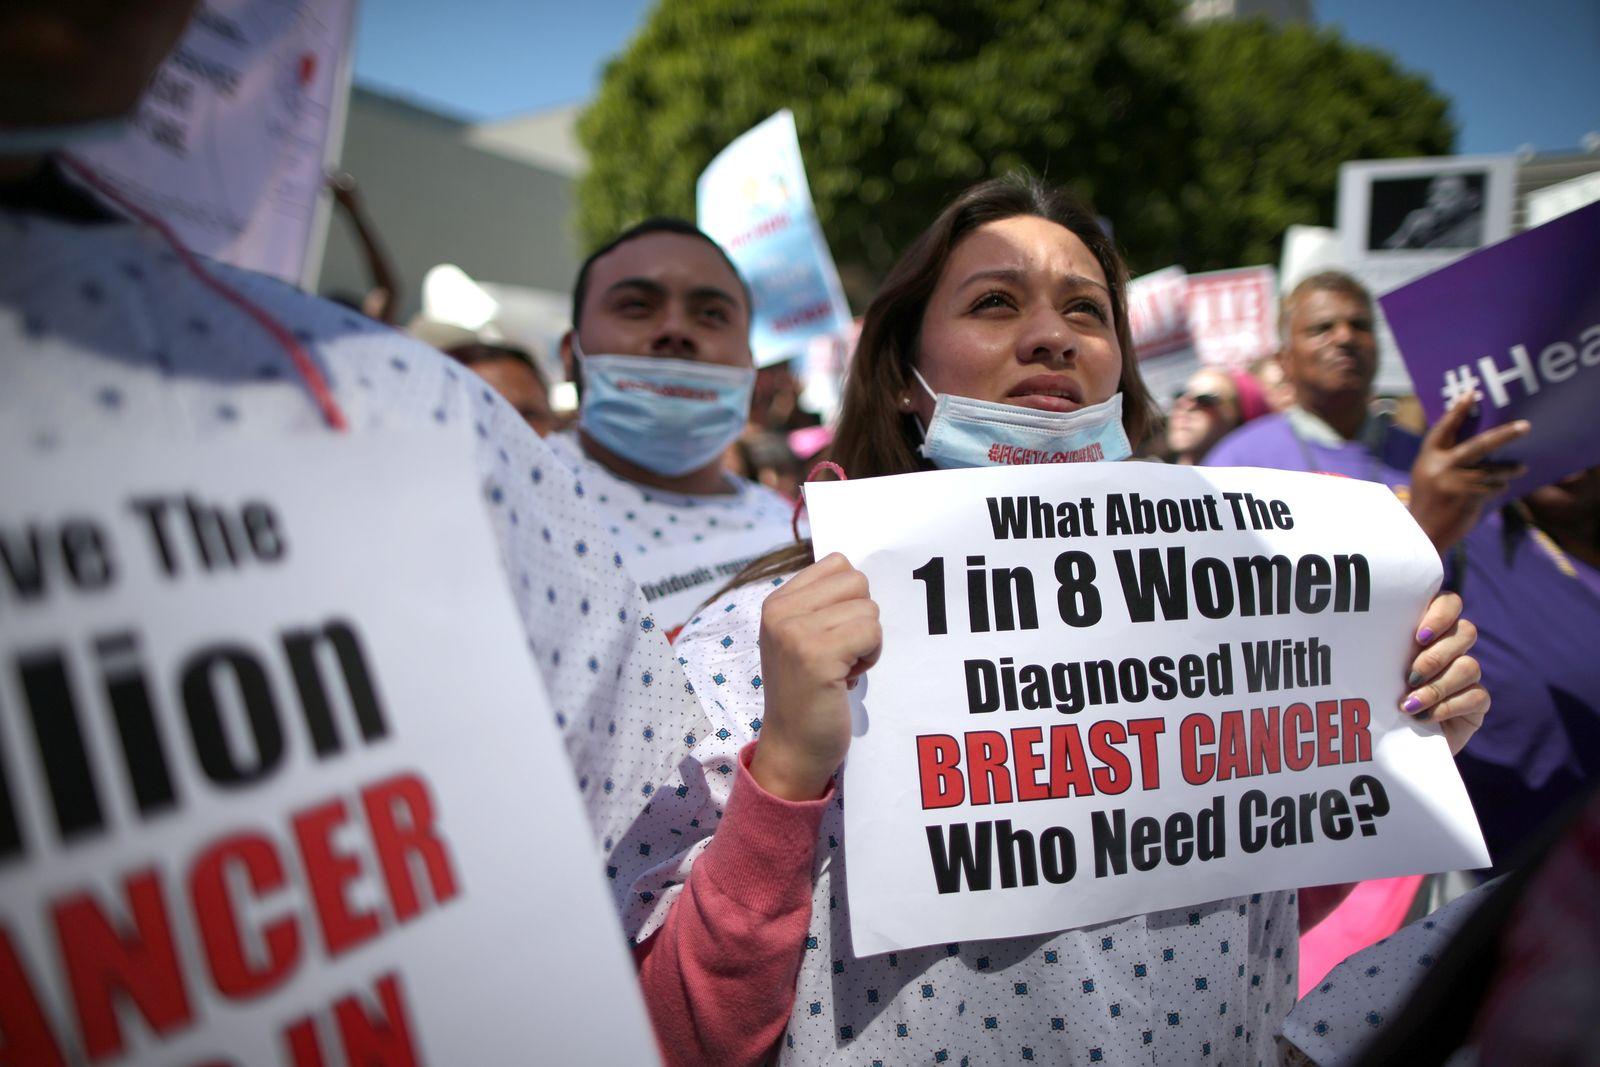 Videoteaser USA-HEALTHCARE/PROTEST-LA